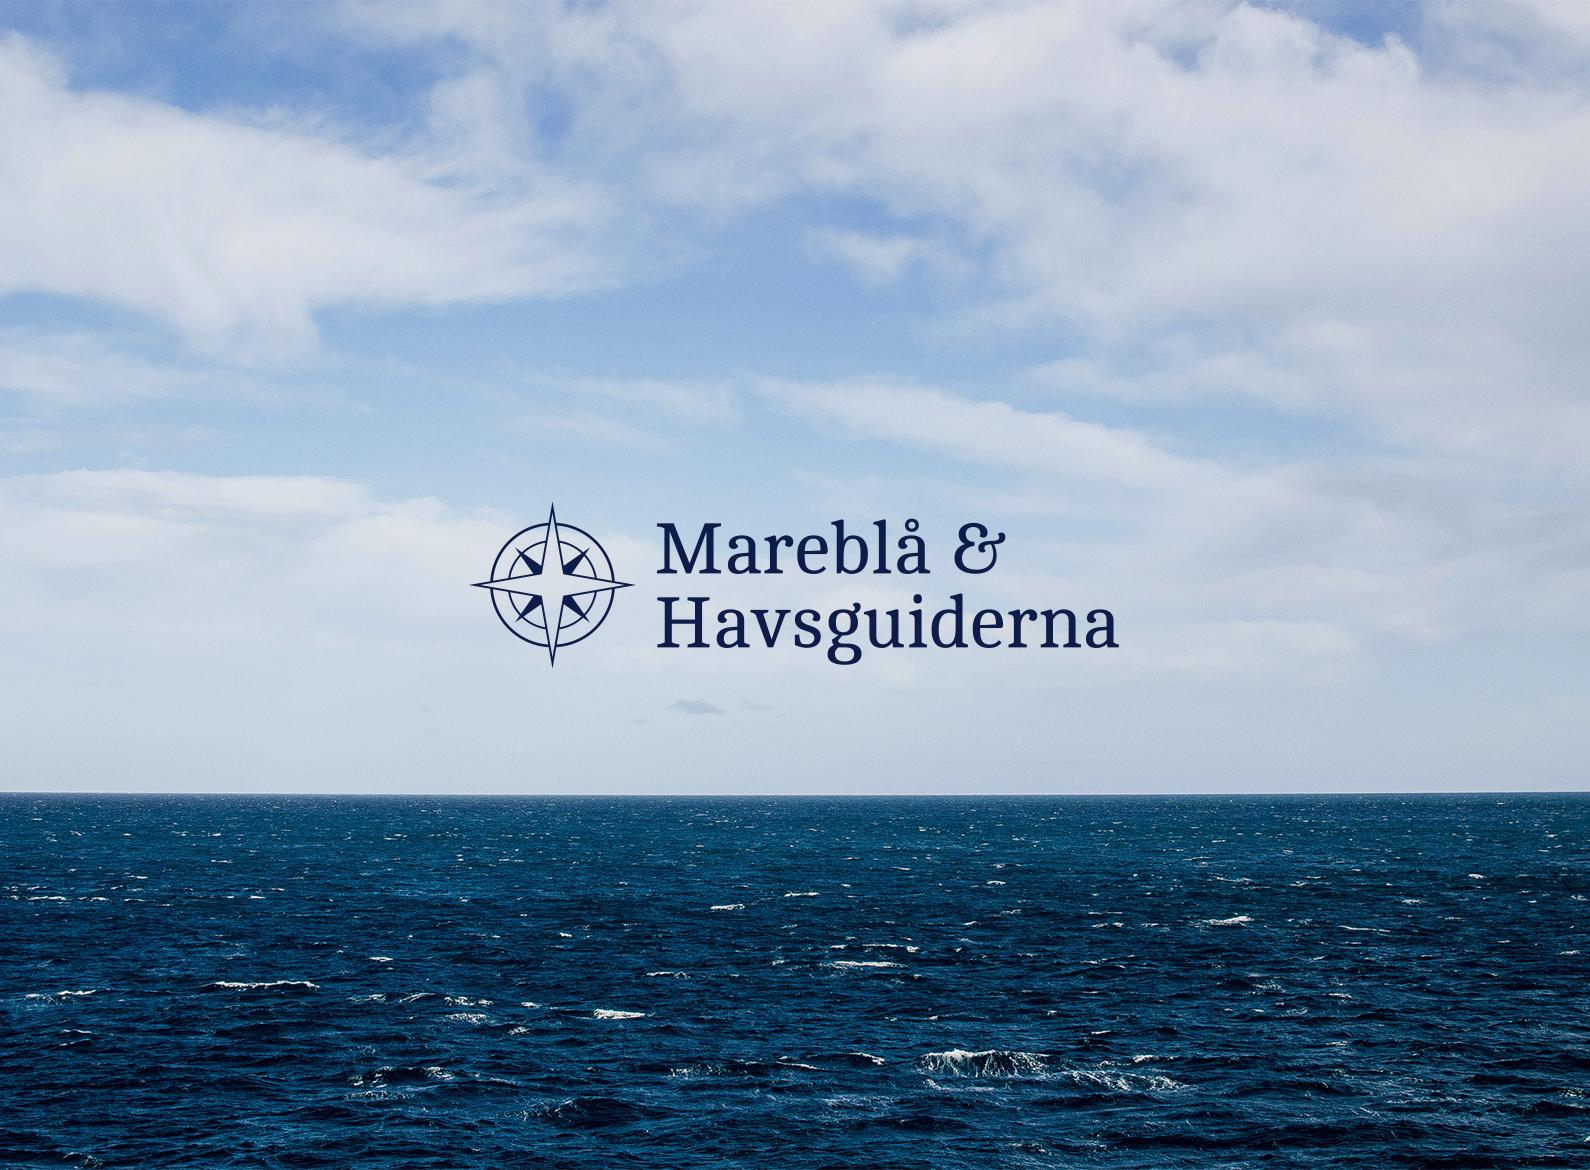 marebla%cc%8a_havsguiderna_01